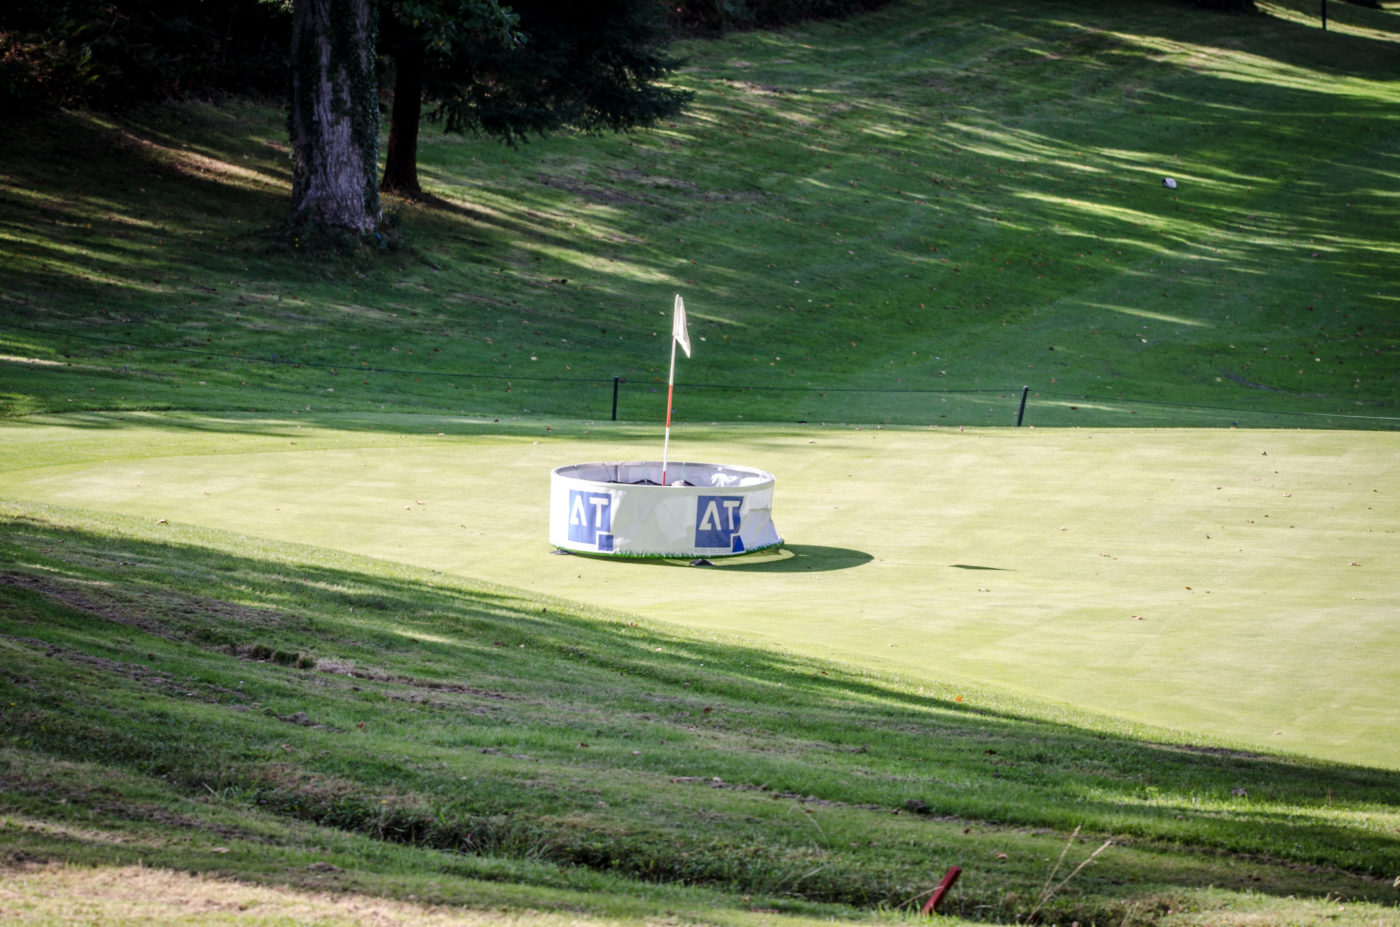 Événement Rugby Golf IRPB 2019 Chantaco Inter réseau Pays basque Agence Erronda audit telecom